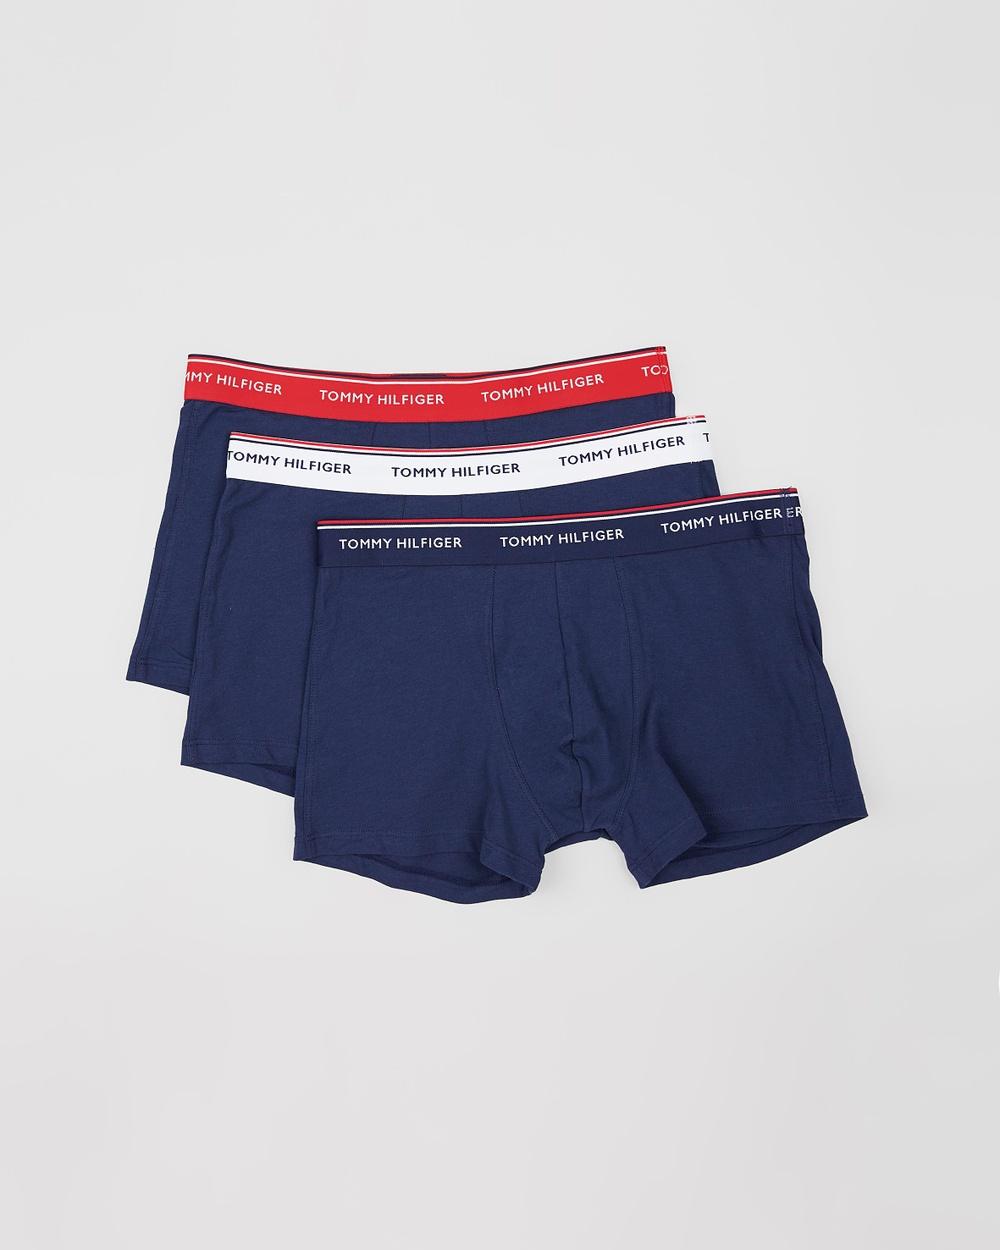 Tommy Hilfiger 3 Pack Premium Essentials Stretch Trunks Underwear & Socks Multi Peacoat 3-Pack